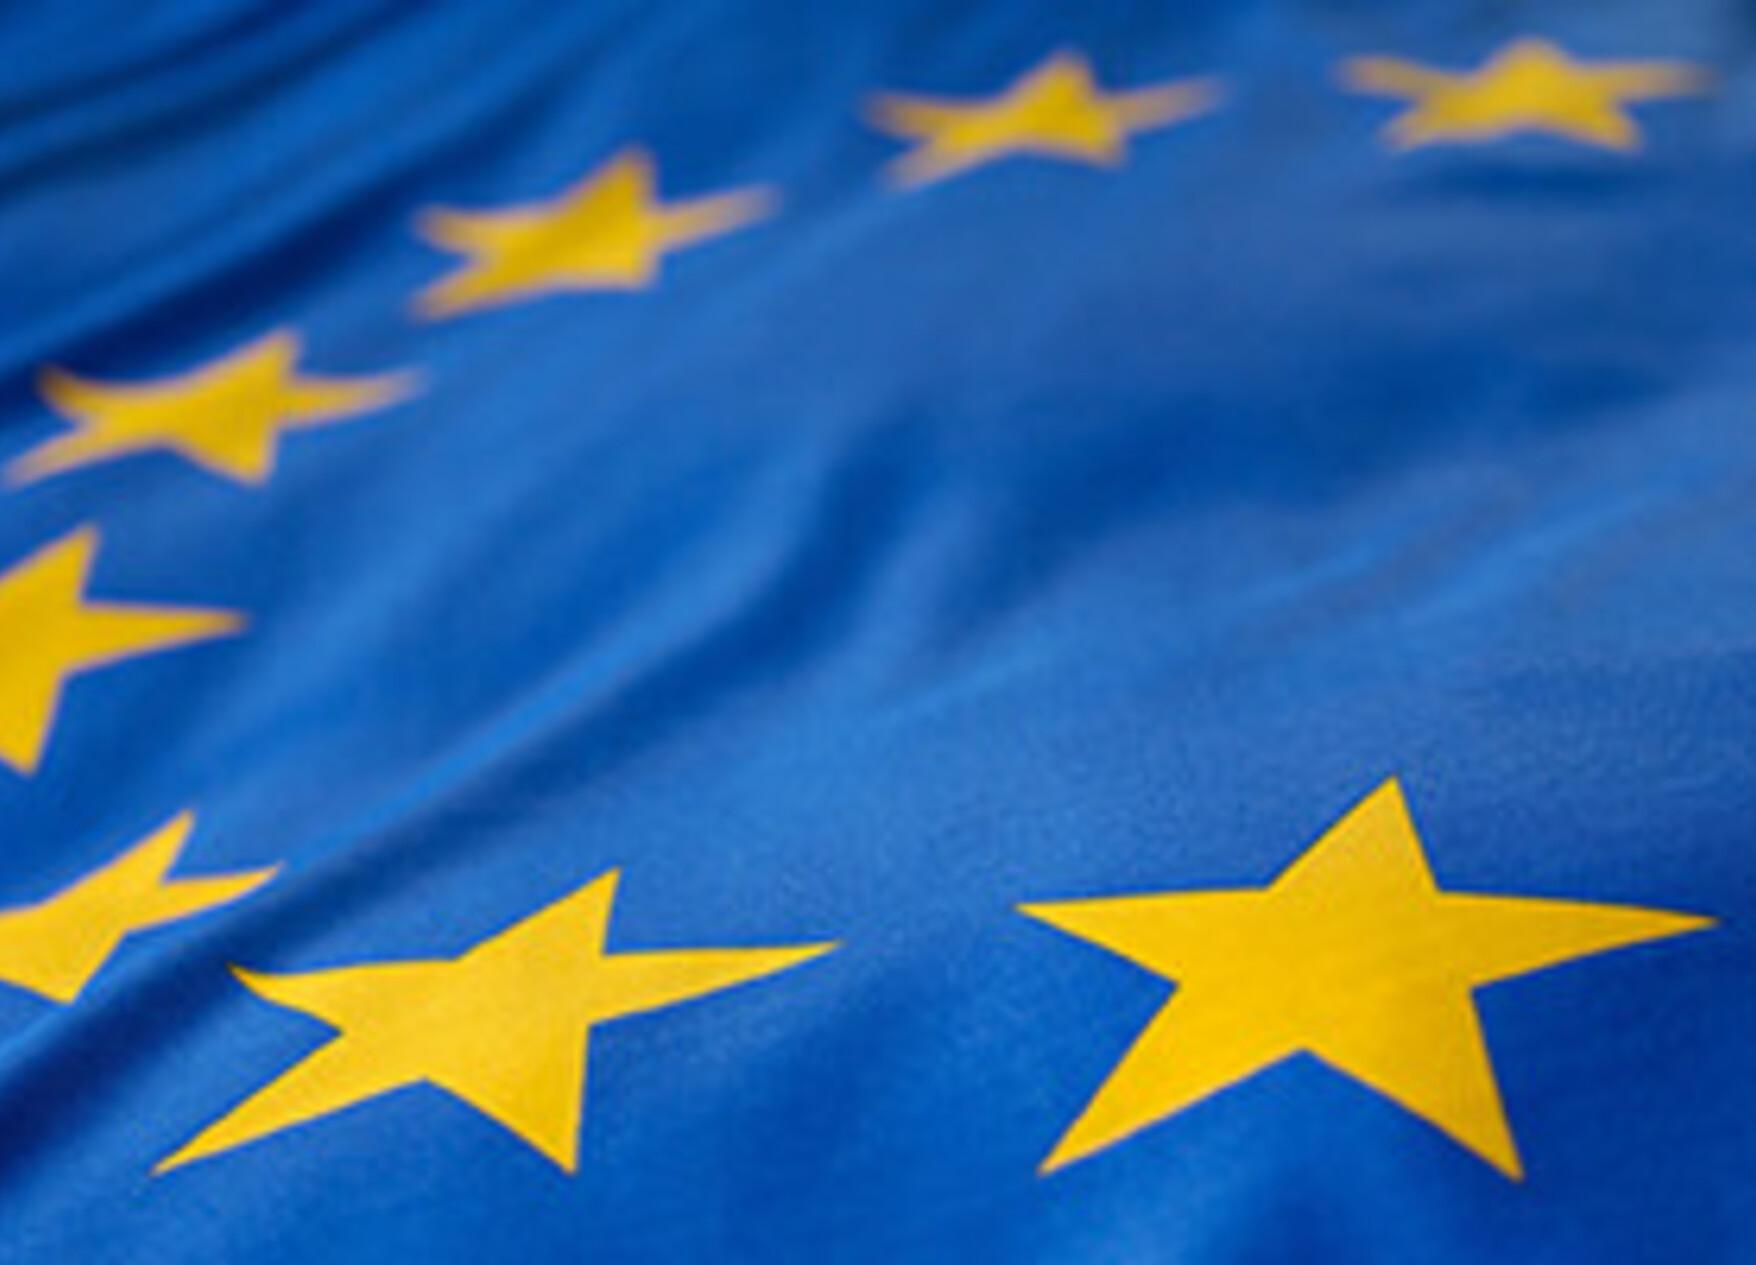 Abbildung EU-Flagge